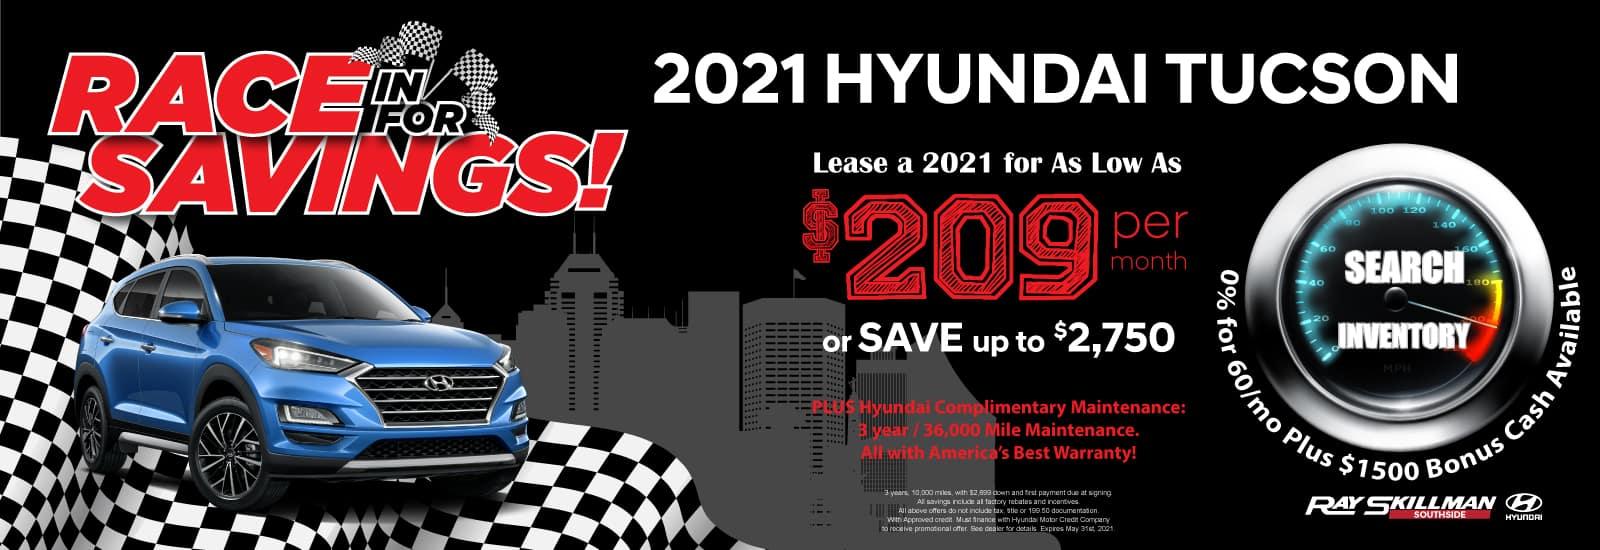 2021-Tucson-Web-Banner-May